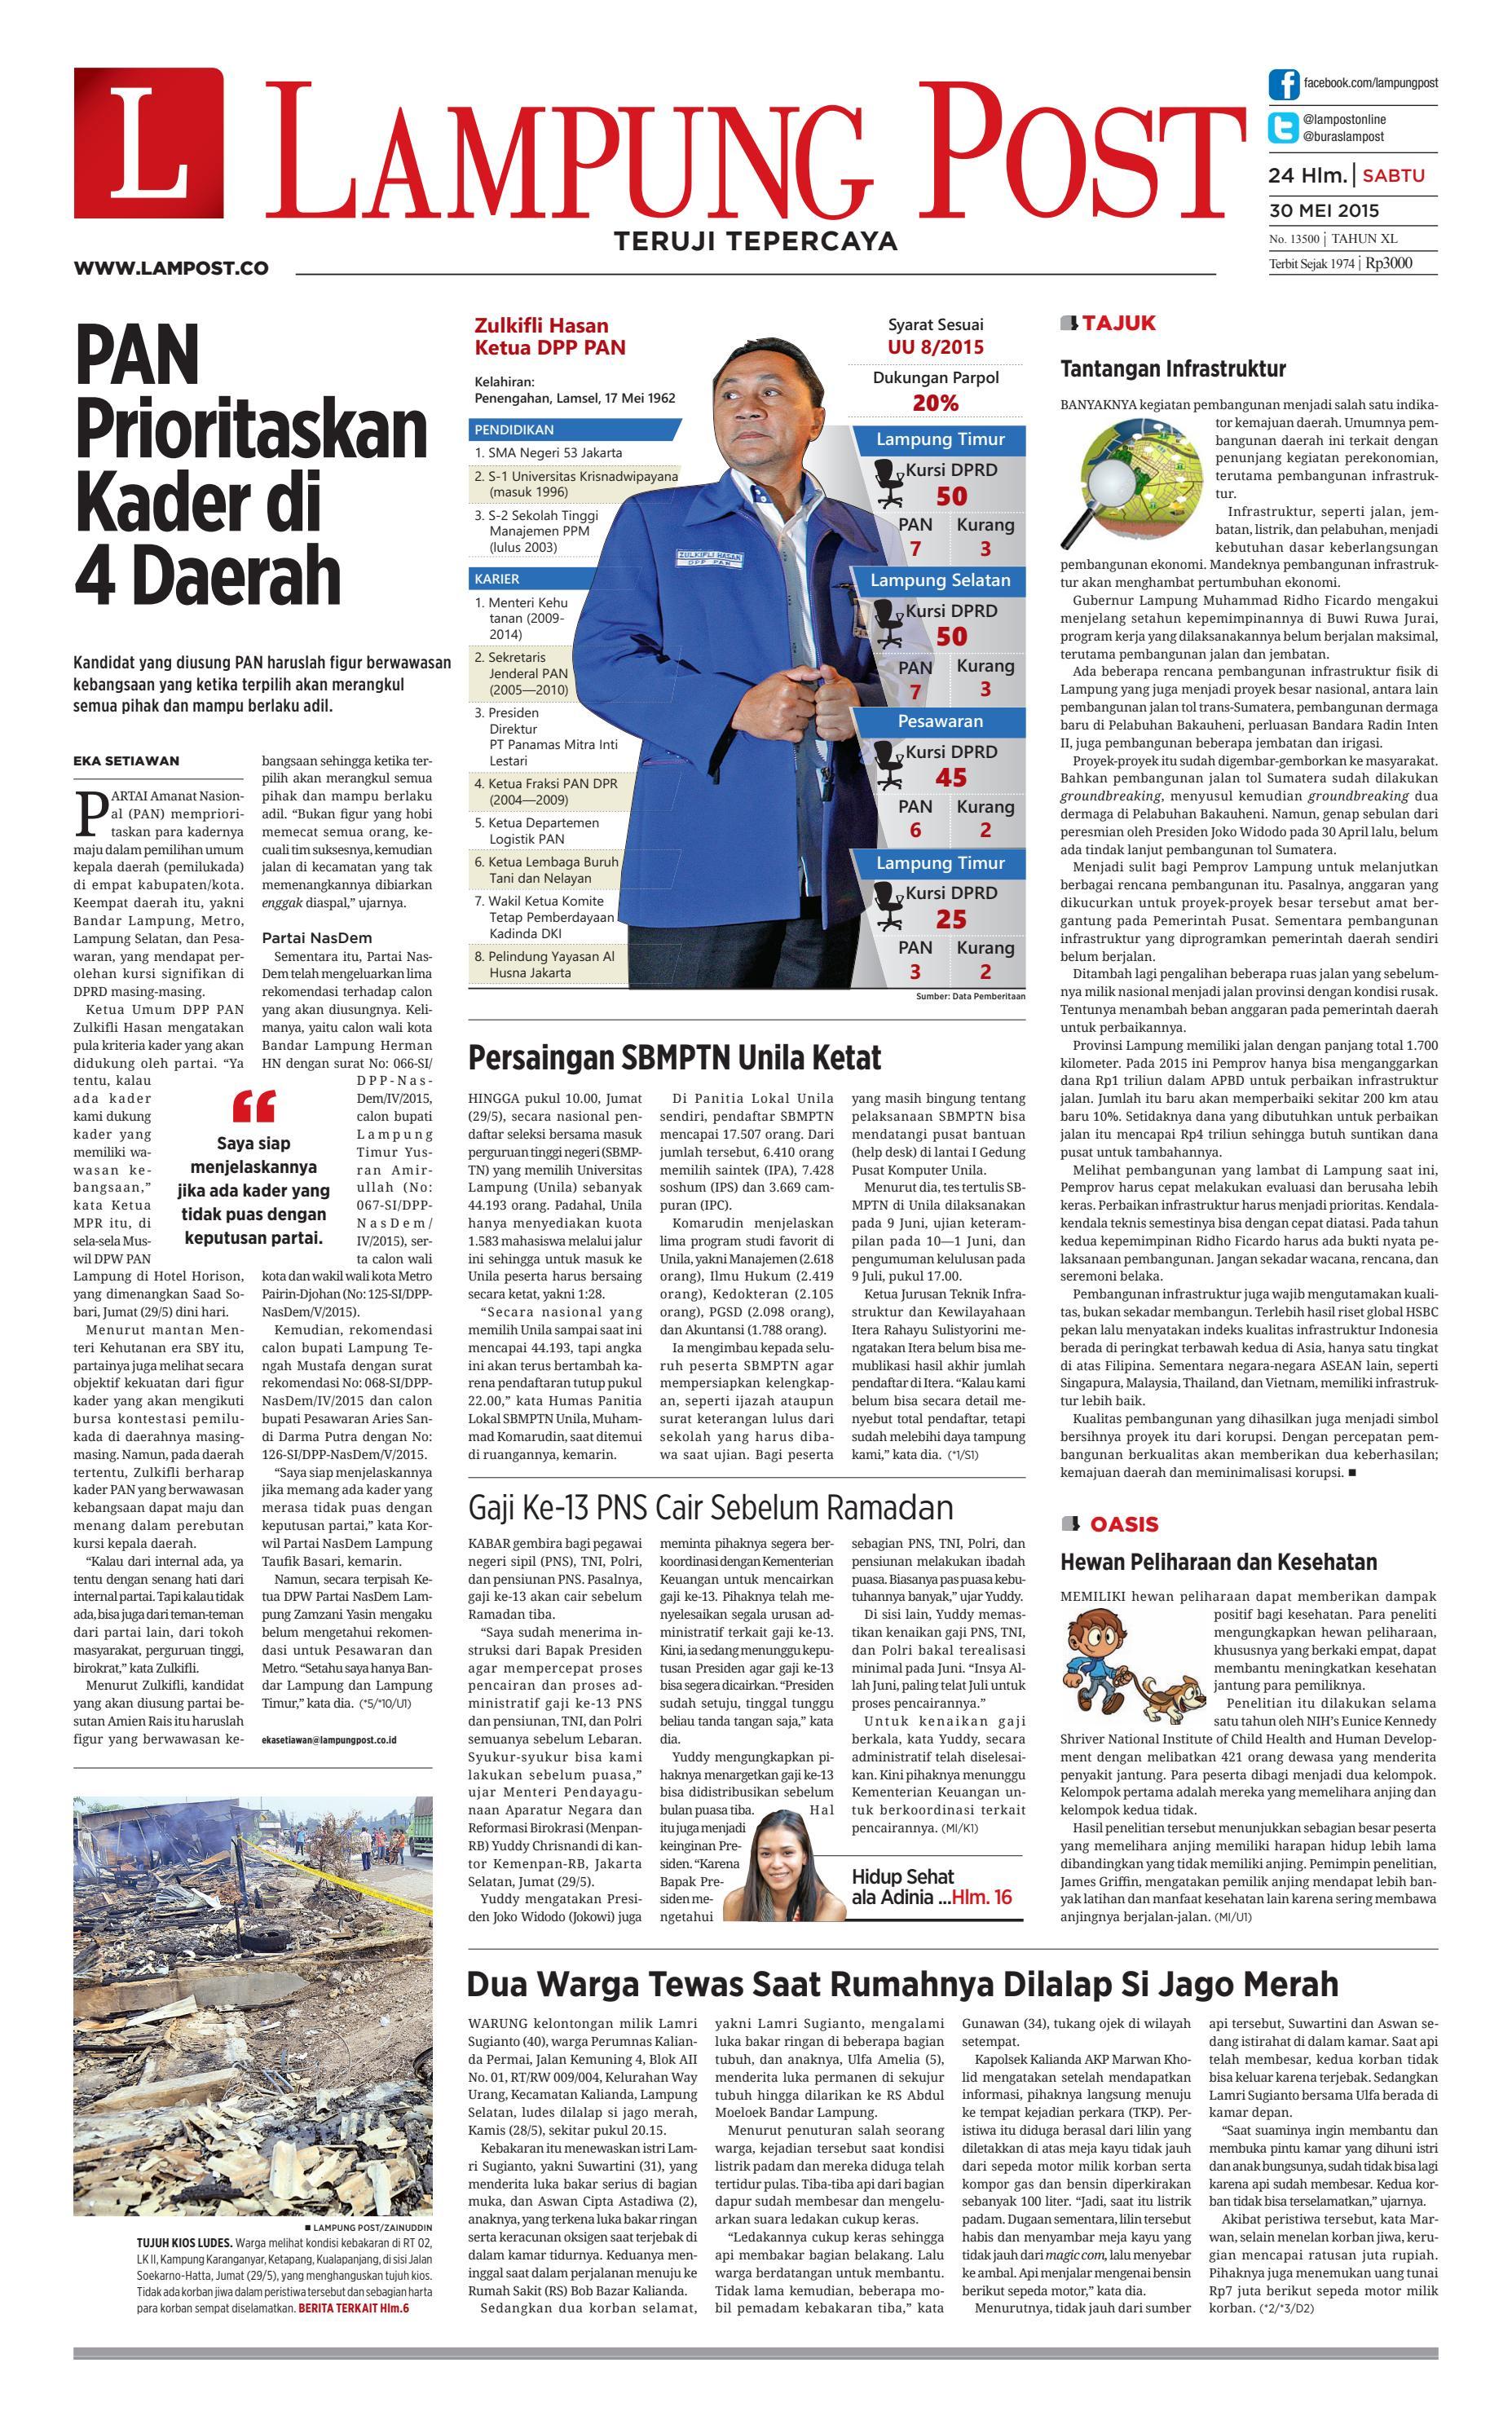 Lampung Post Sabtu 30 Mei 2015 By Issuu Produk Ukm Bumn Sulam Usus Pmk